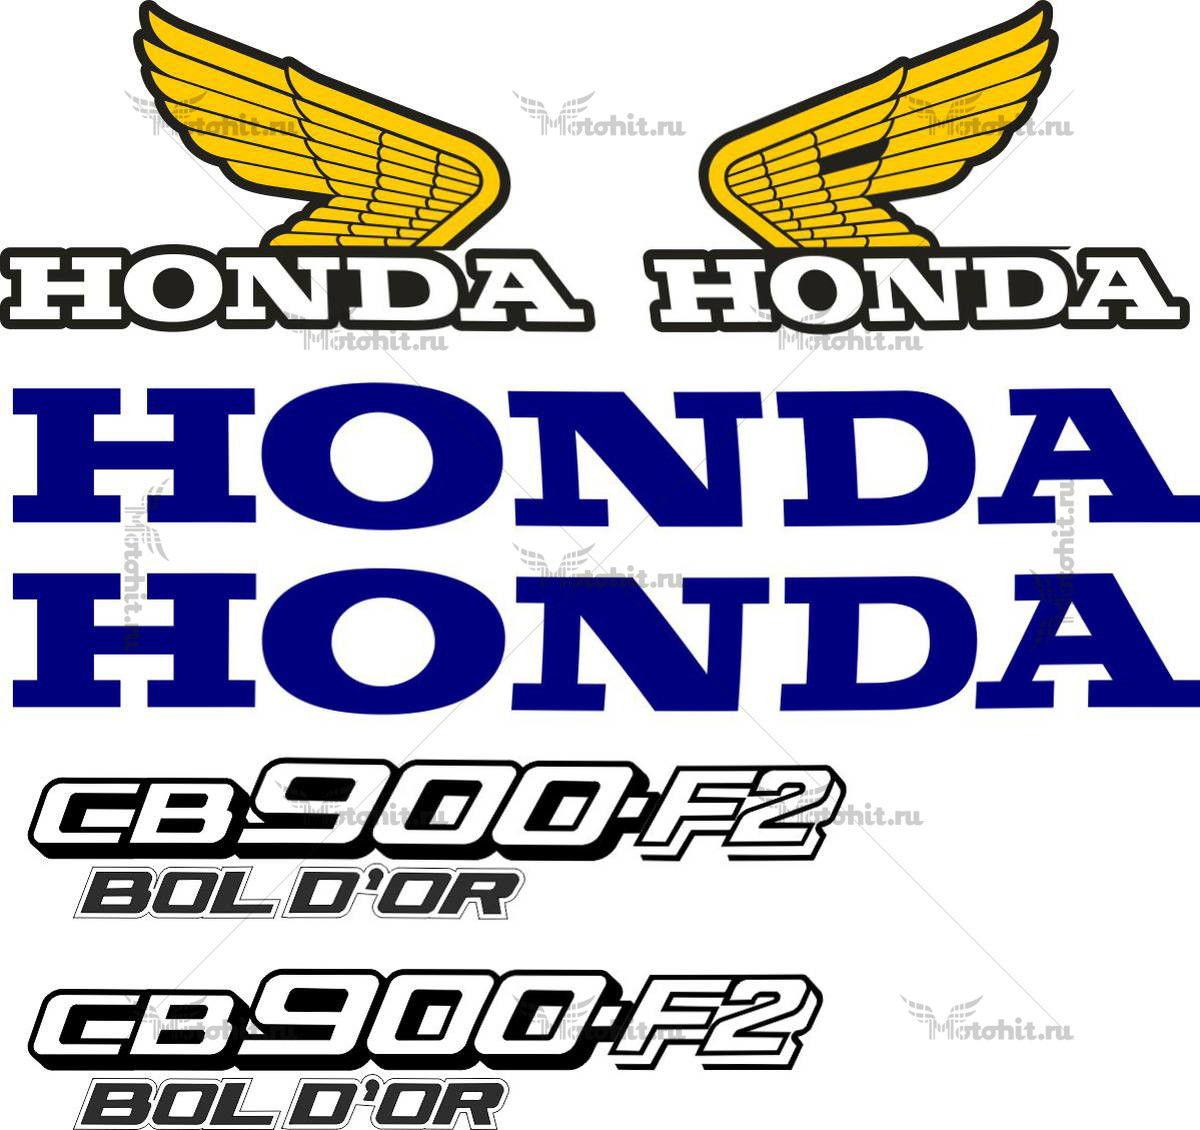 Комплект наклеек Honda CB-900-F2 1978